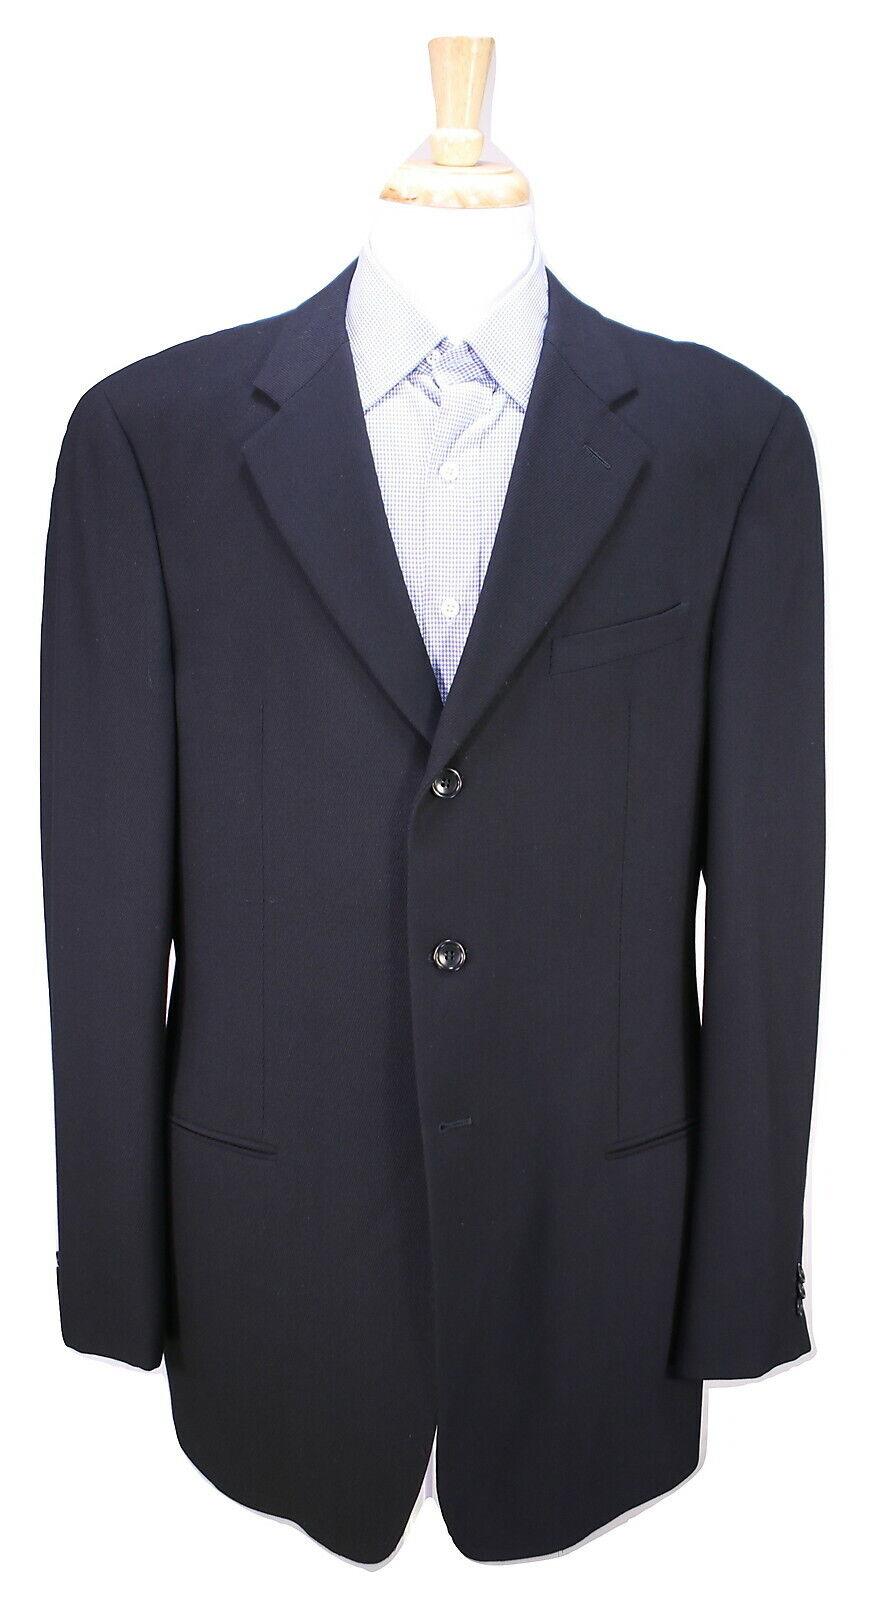 Armani COLLEZIONI  Sarga Negro  Sólido Chaqueta Blazer de lana 3-Btn 43L 42L  genuina alta calidad